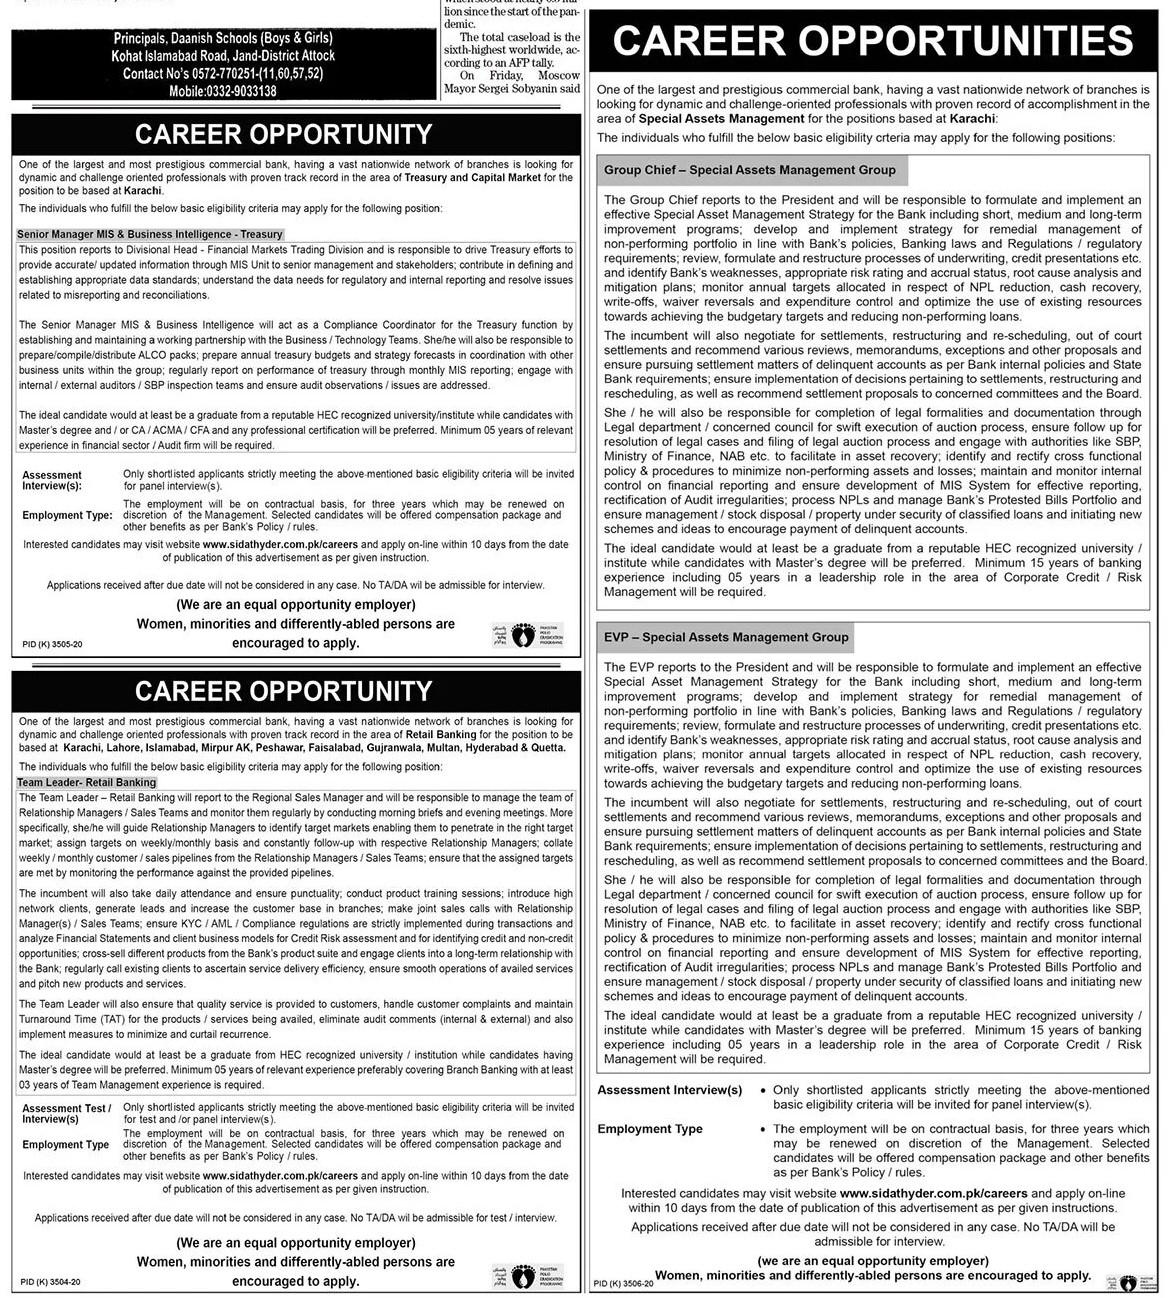 www.sidathyder.com.pk Jobs 2021 - Largest & Most Prestigious Commercial Bank Jobs 2021 in Pakistan